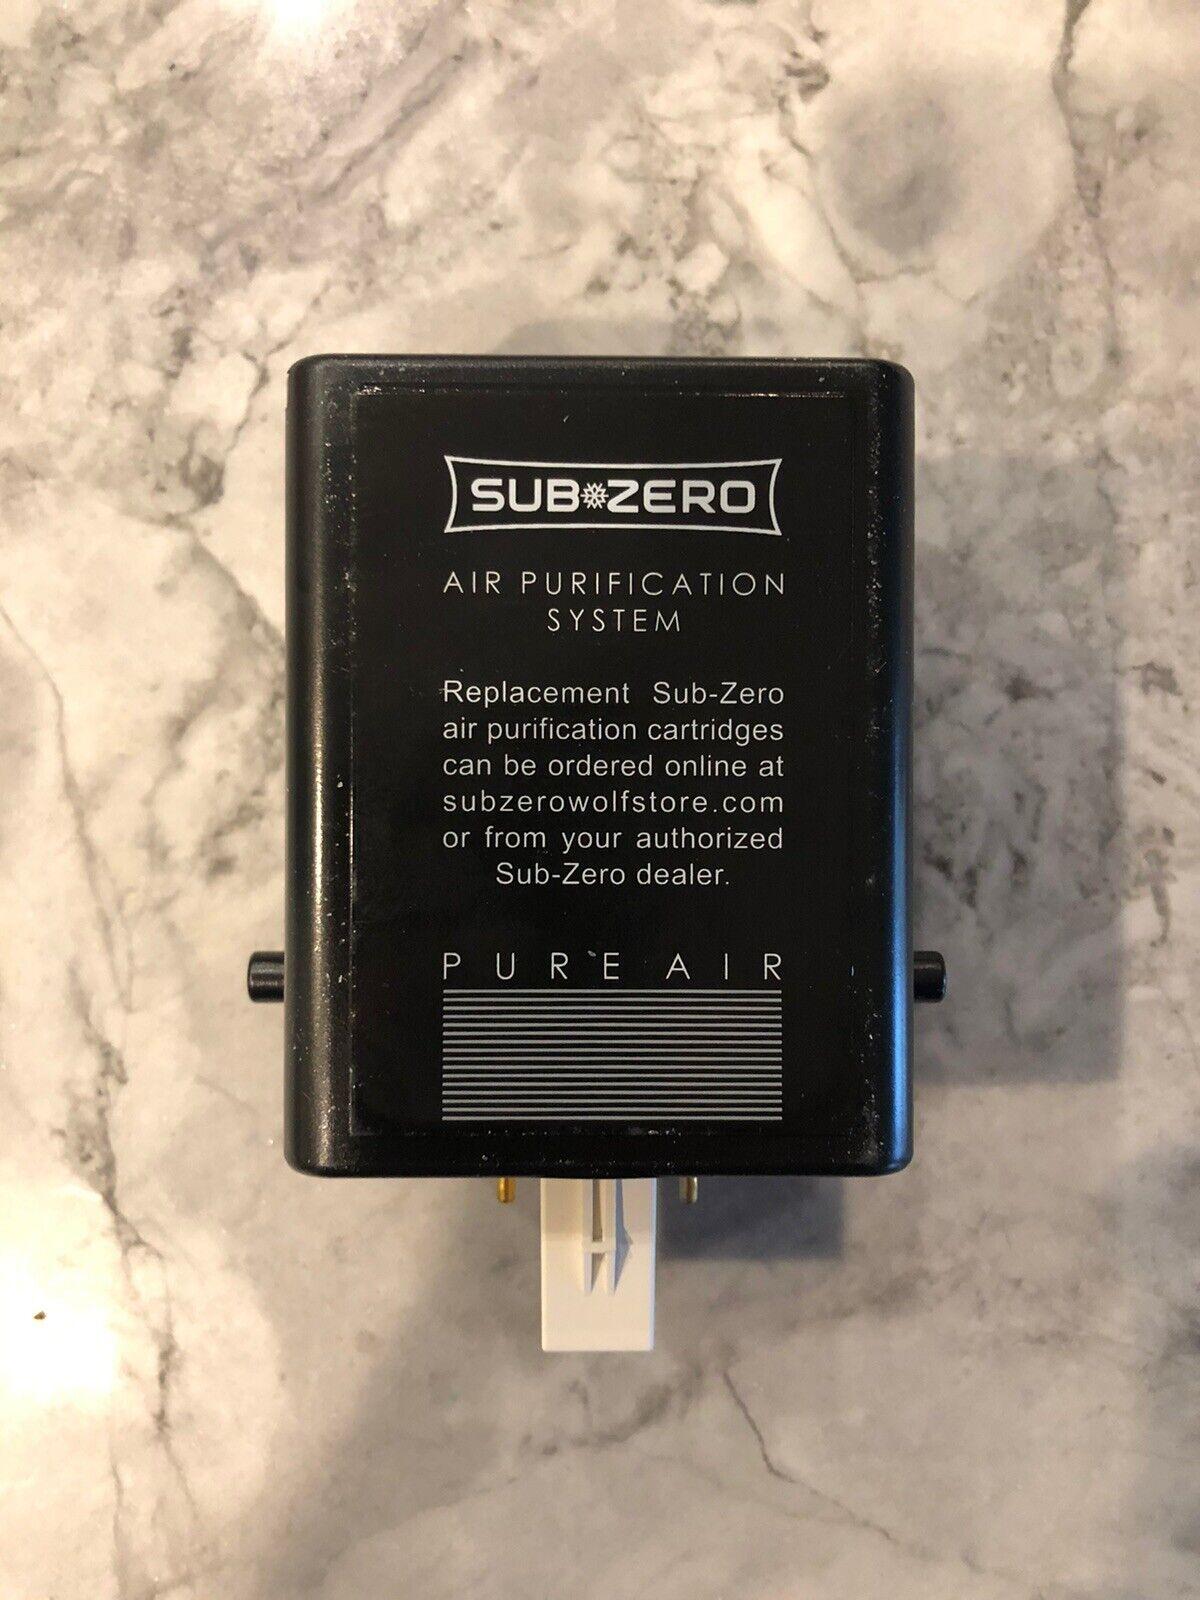 Sub-Zero 7007067 Refrigerator Air Purification Cartridge Filter